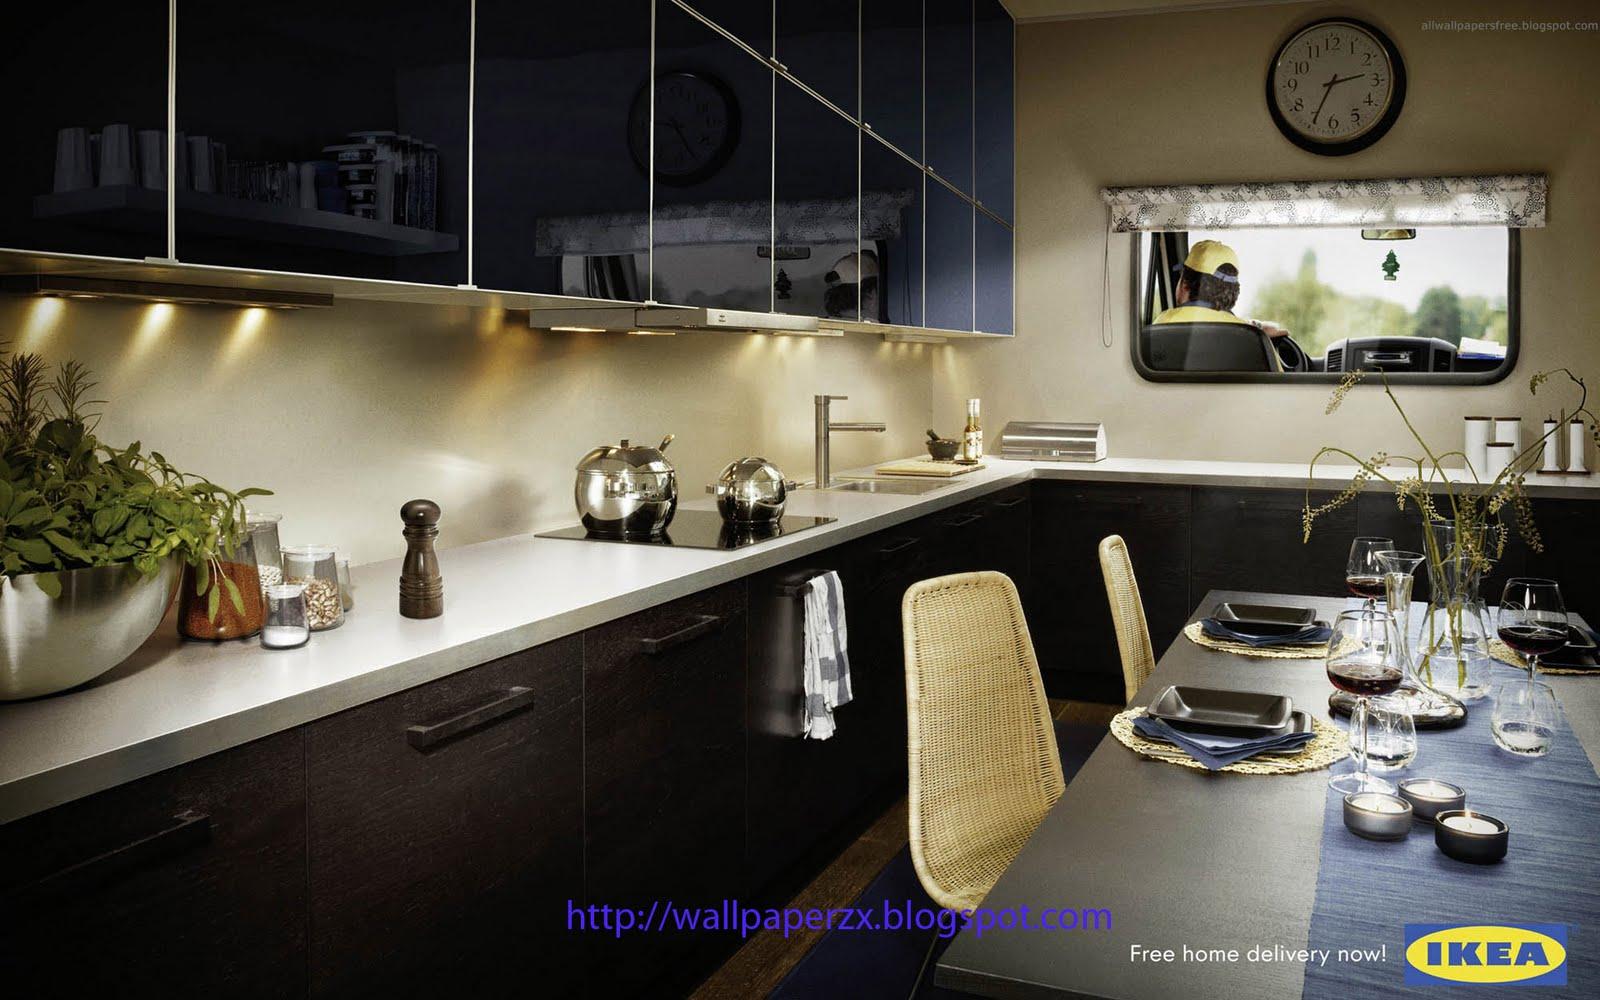 http://1.bp.blogspot.com/_q6wKDx8aGd0/S9w51r_oR6I/AAAAAAAAG3E/sBm6Y-FTTgA/s1600/22.jpg